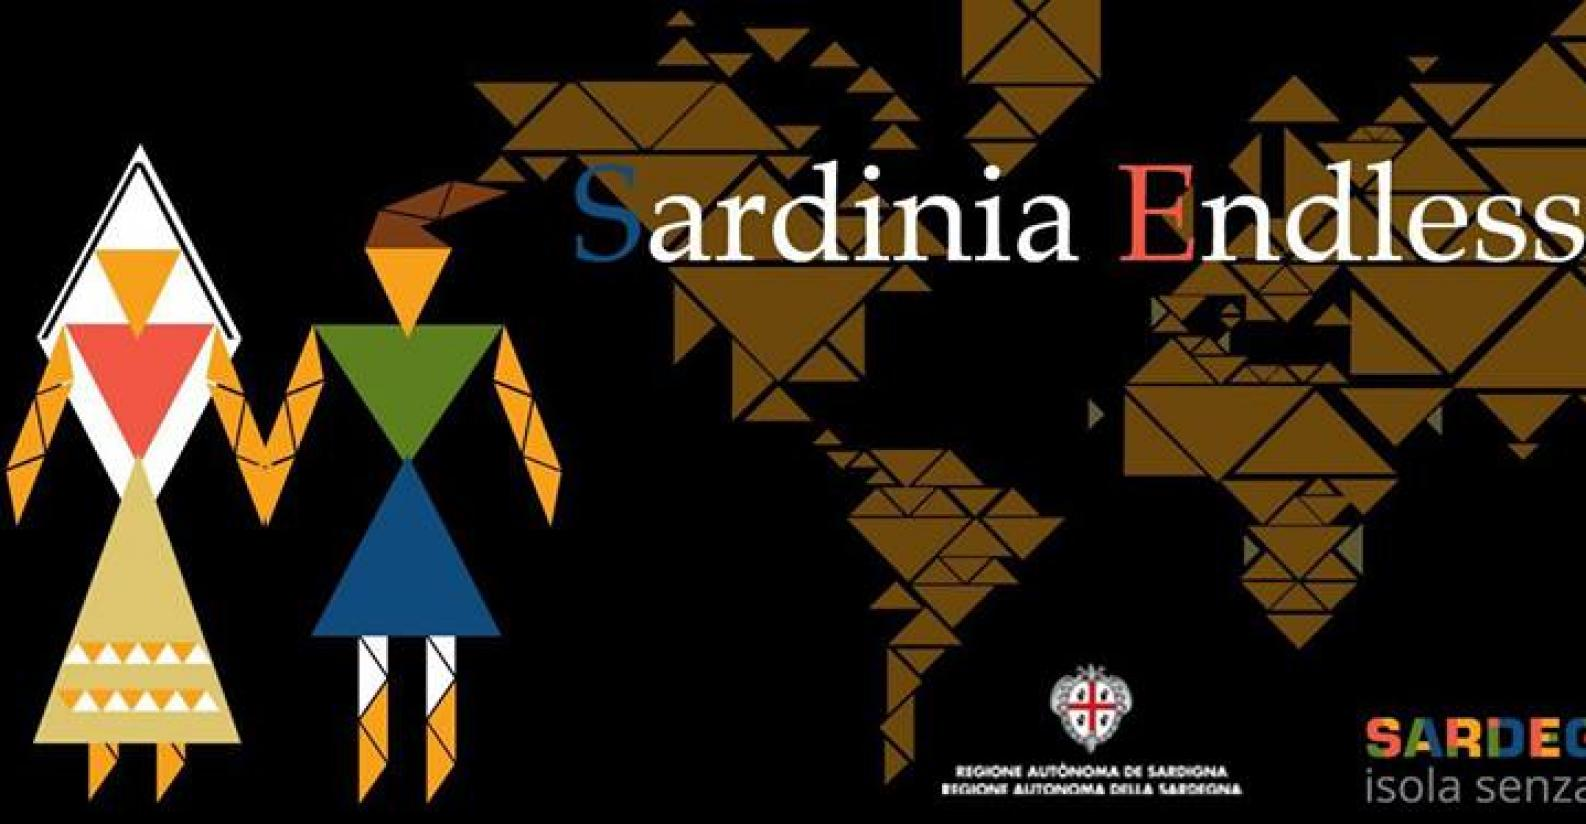 Sardinia Endless Island (locandina)